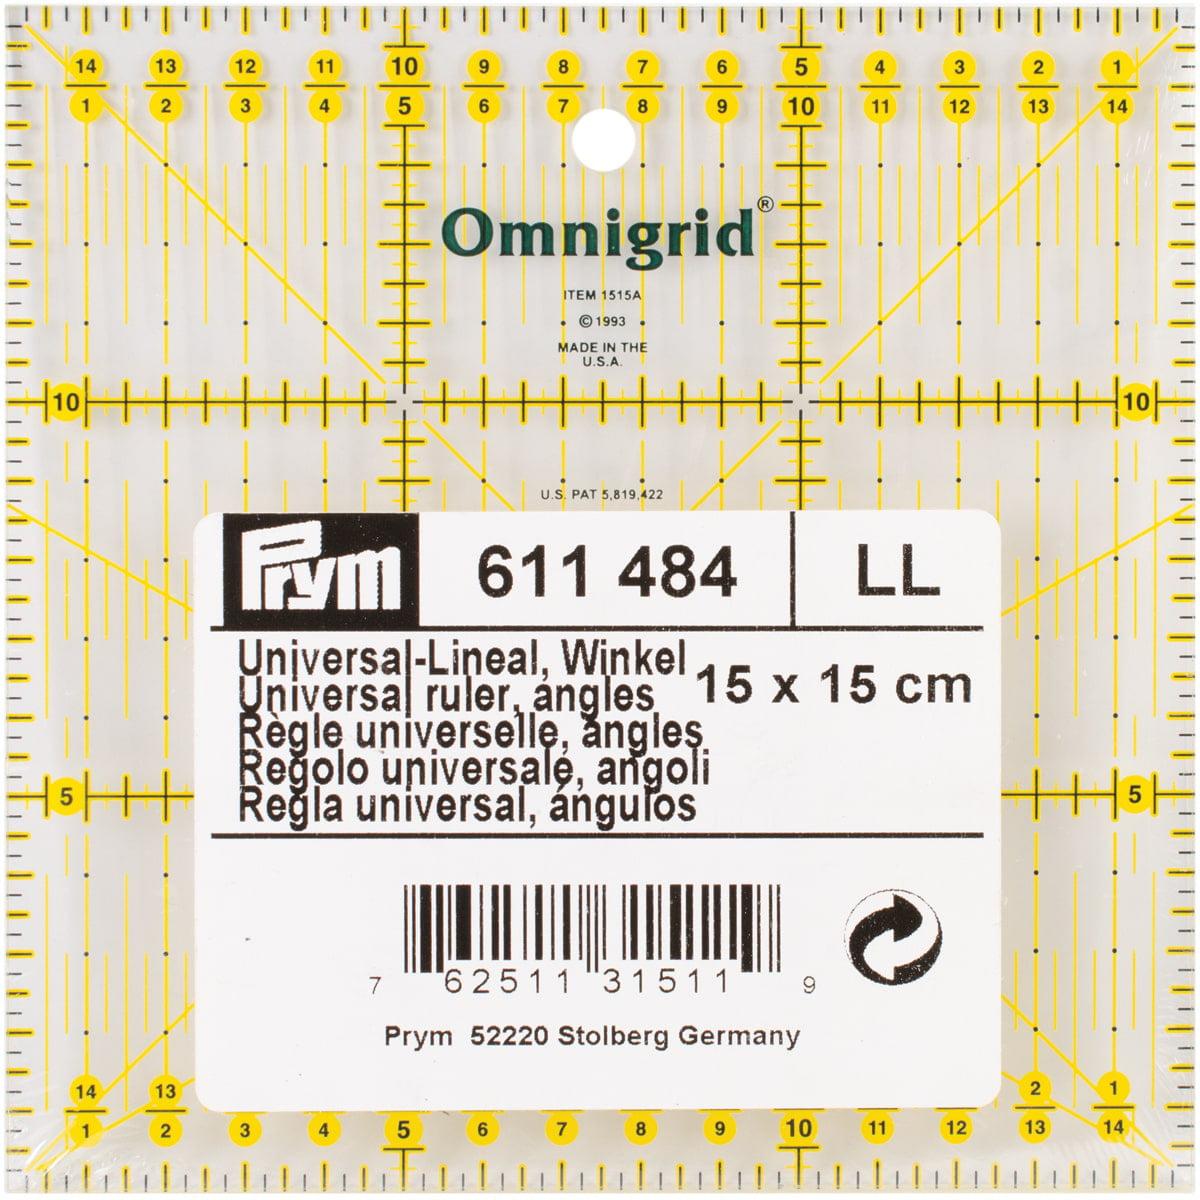 Dritz Omnigrid Metric Quilter's Ruler-15cm X 15 Cm W/Angles